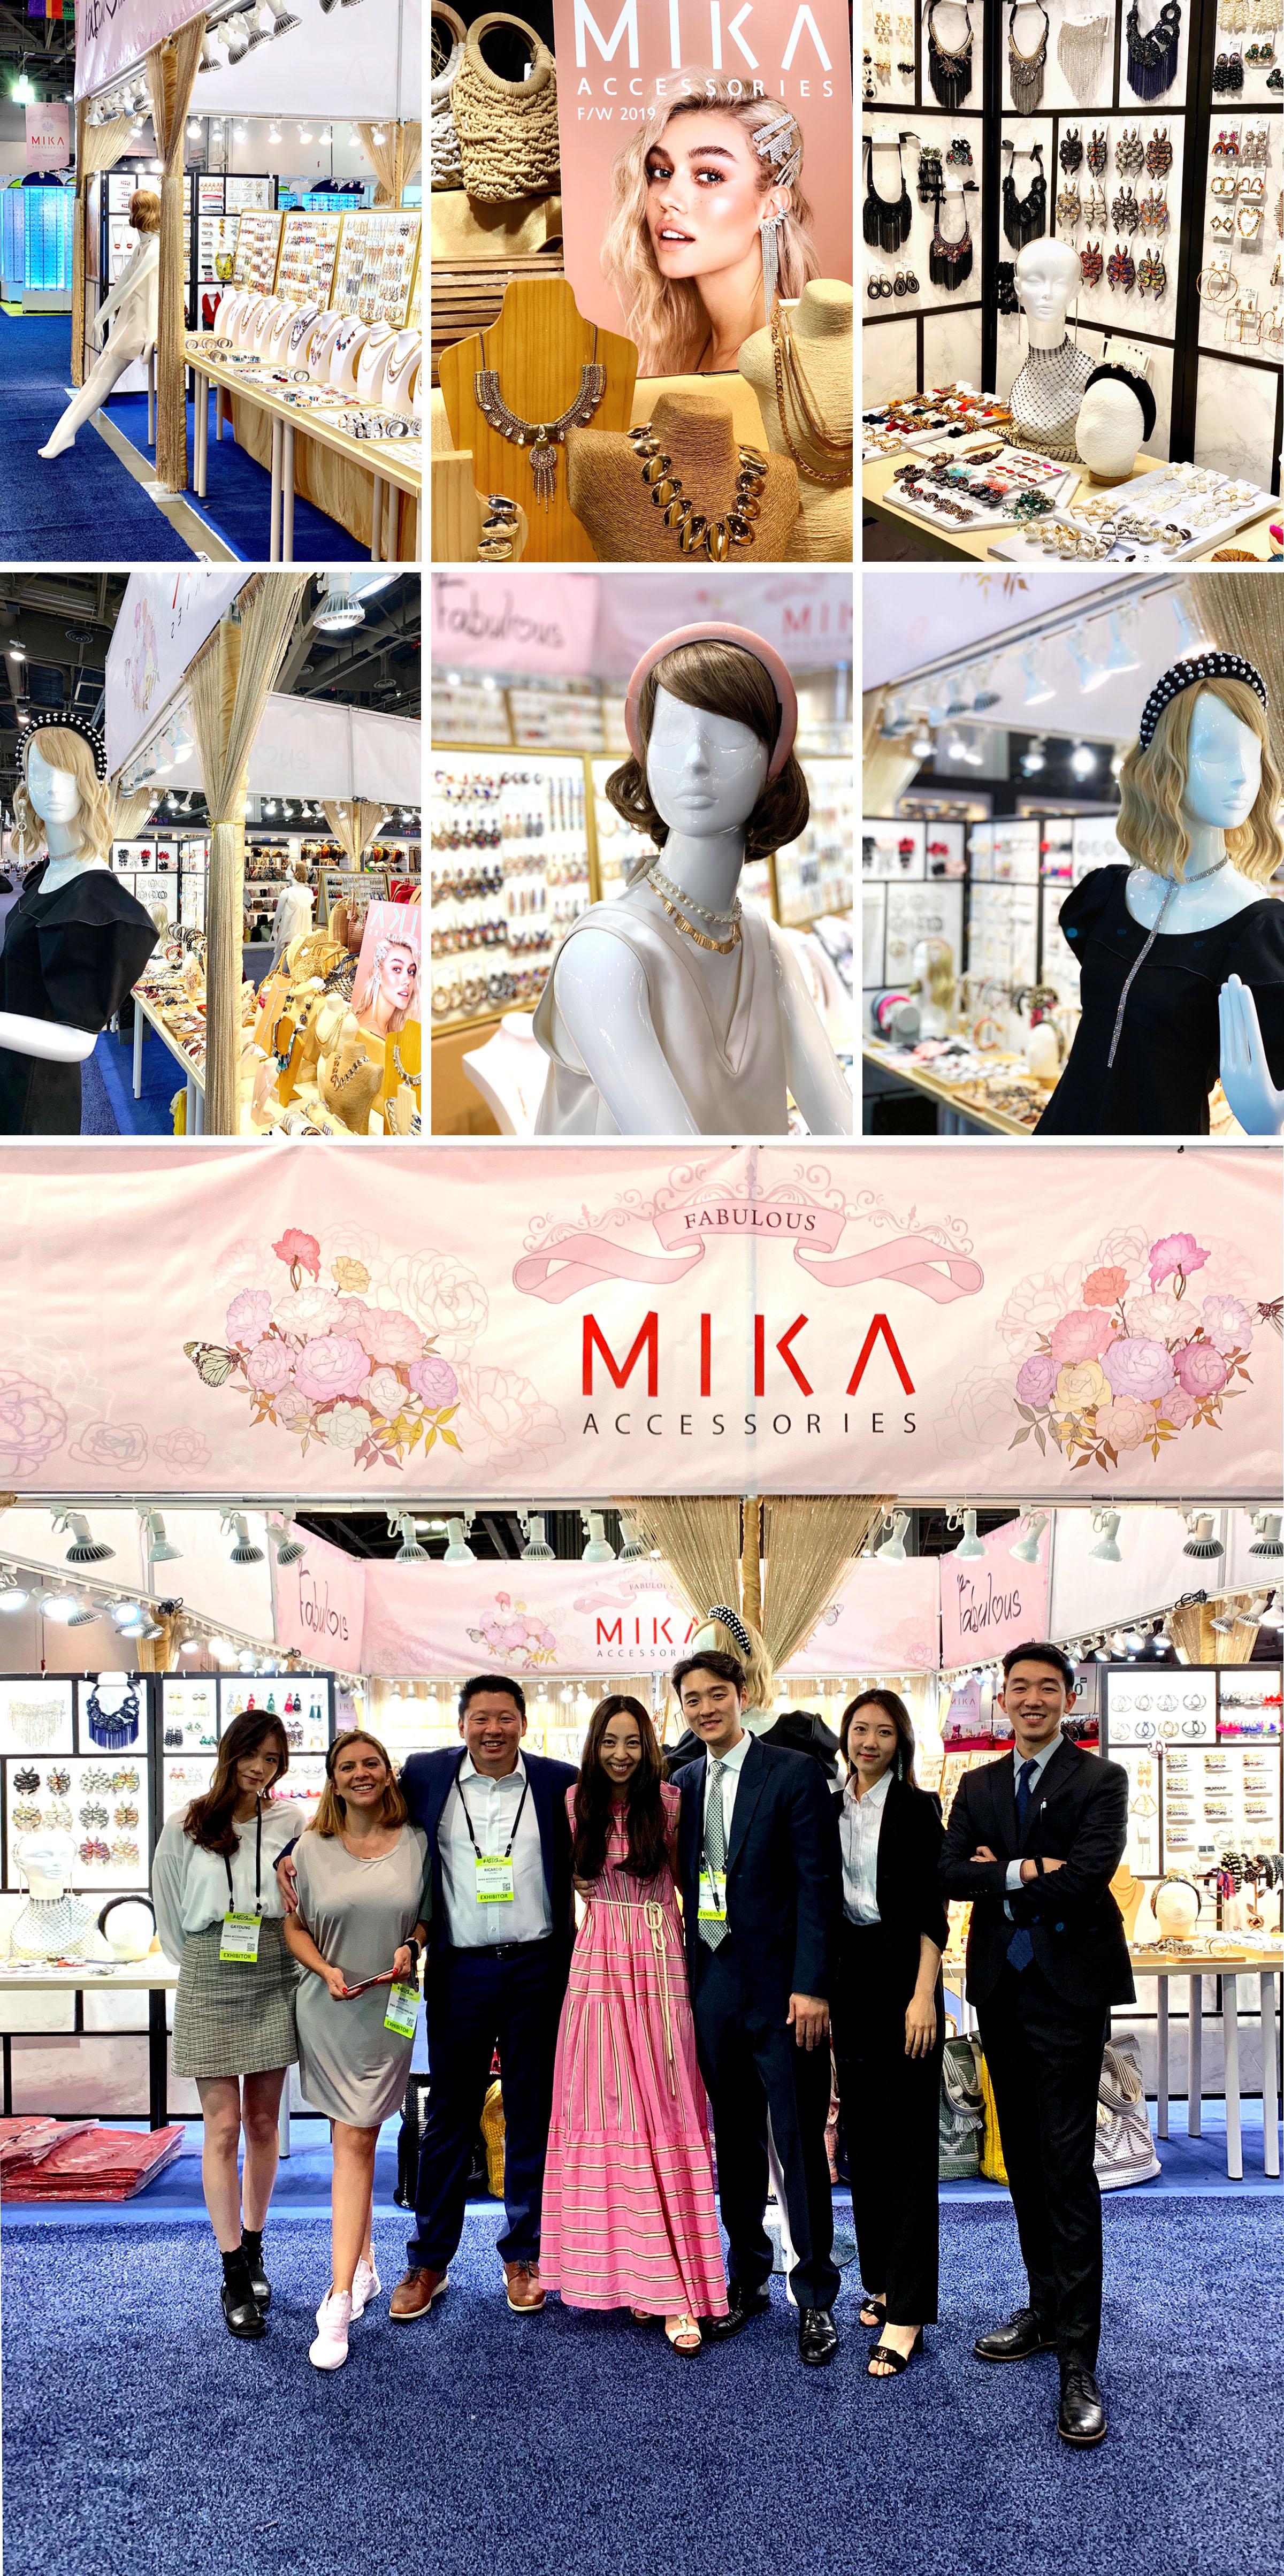 MIKA ASD MARKET WEEK AUGUST 2019 SHOW